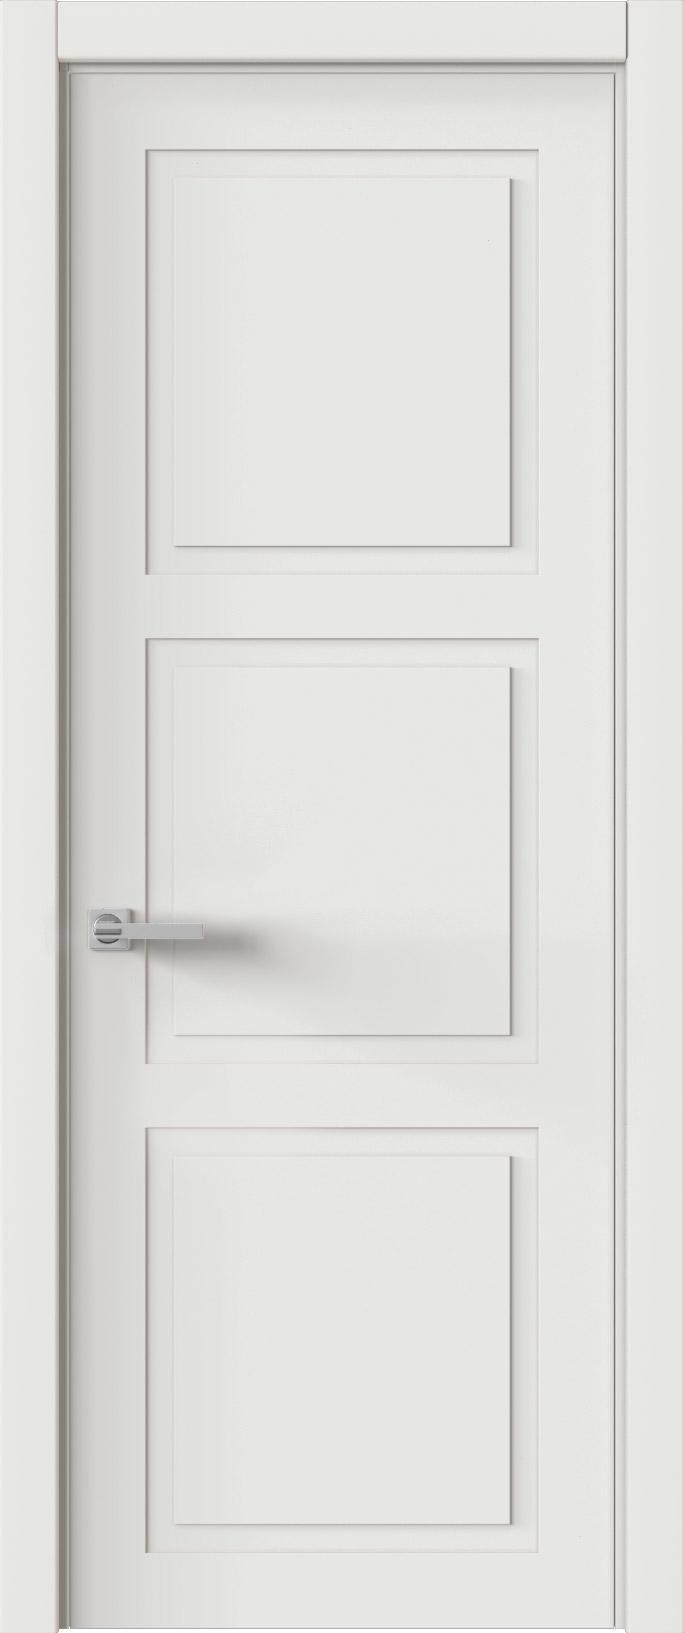 Tivoli Л-5 цвет - Белая эмаль (RAL 9003) Без стекла (ДГ)